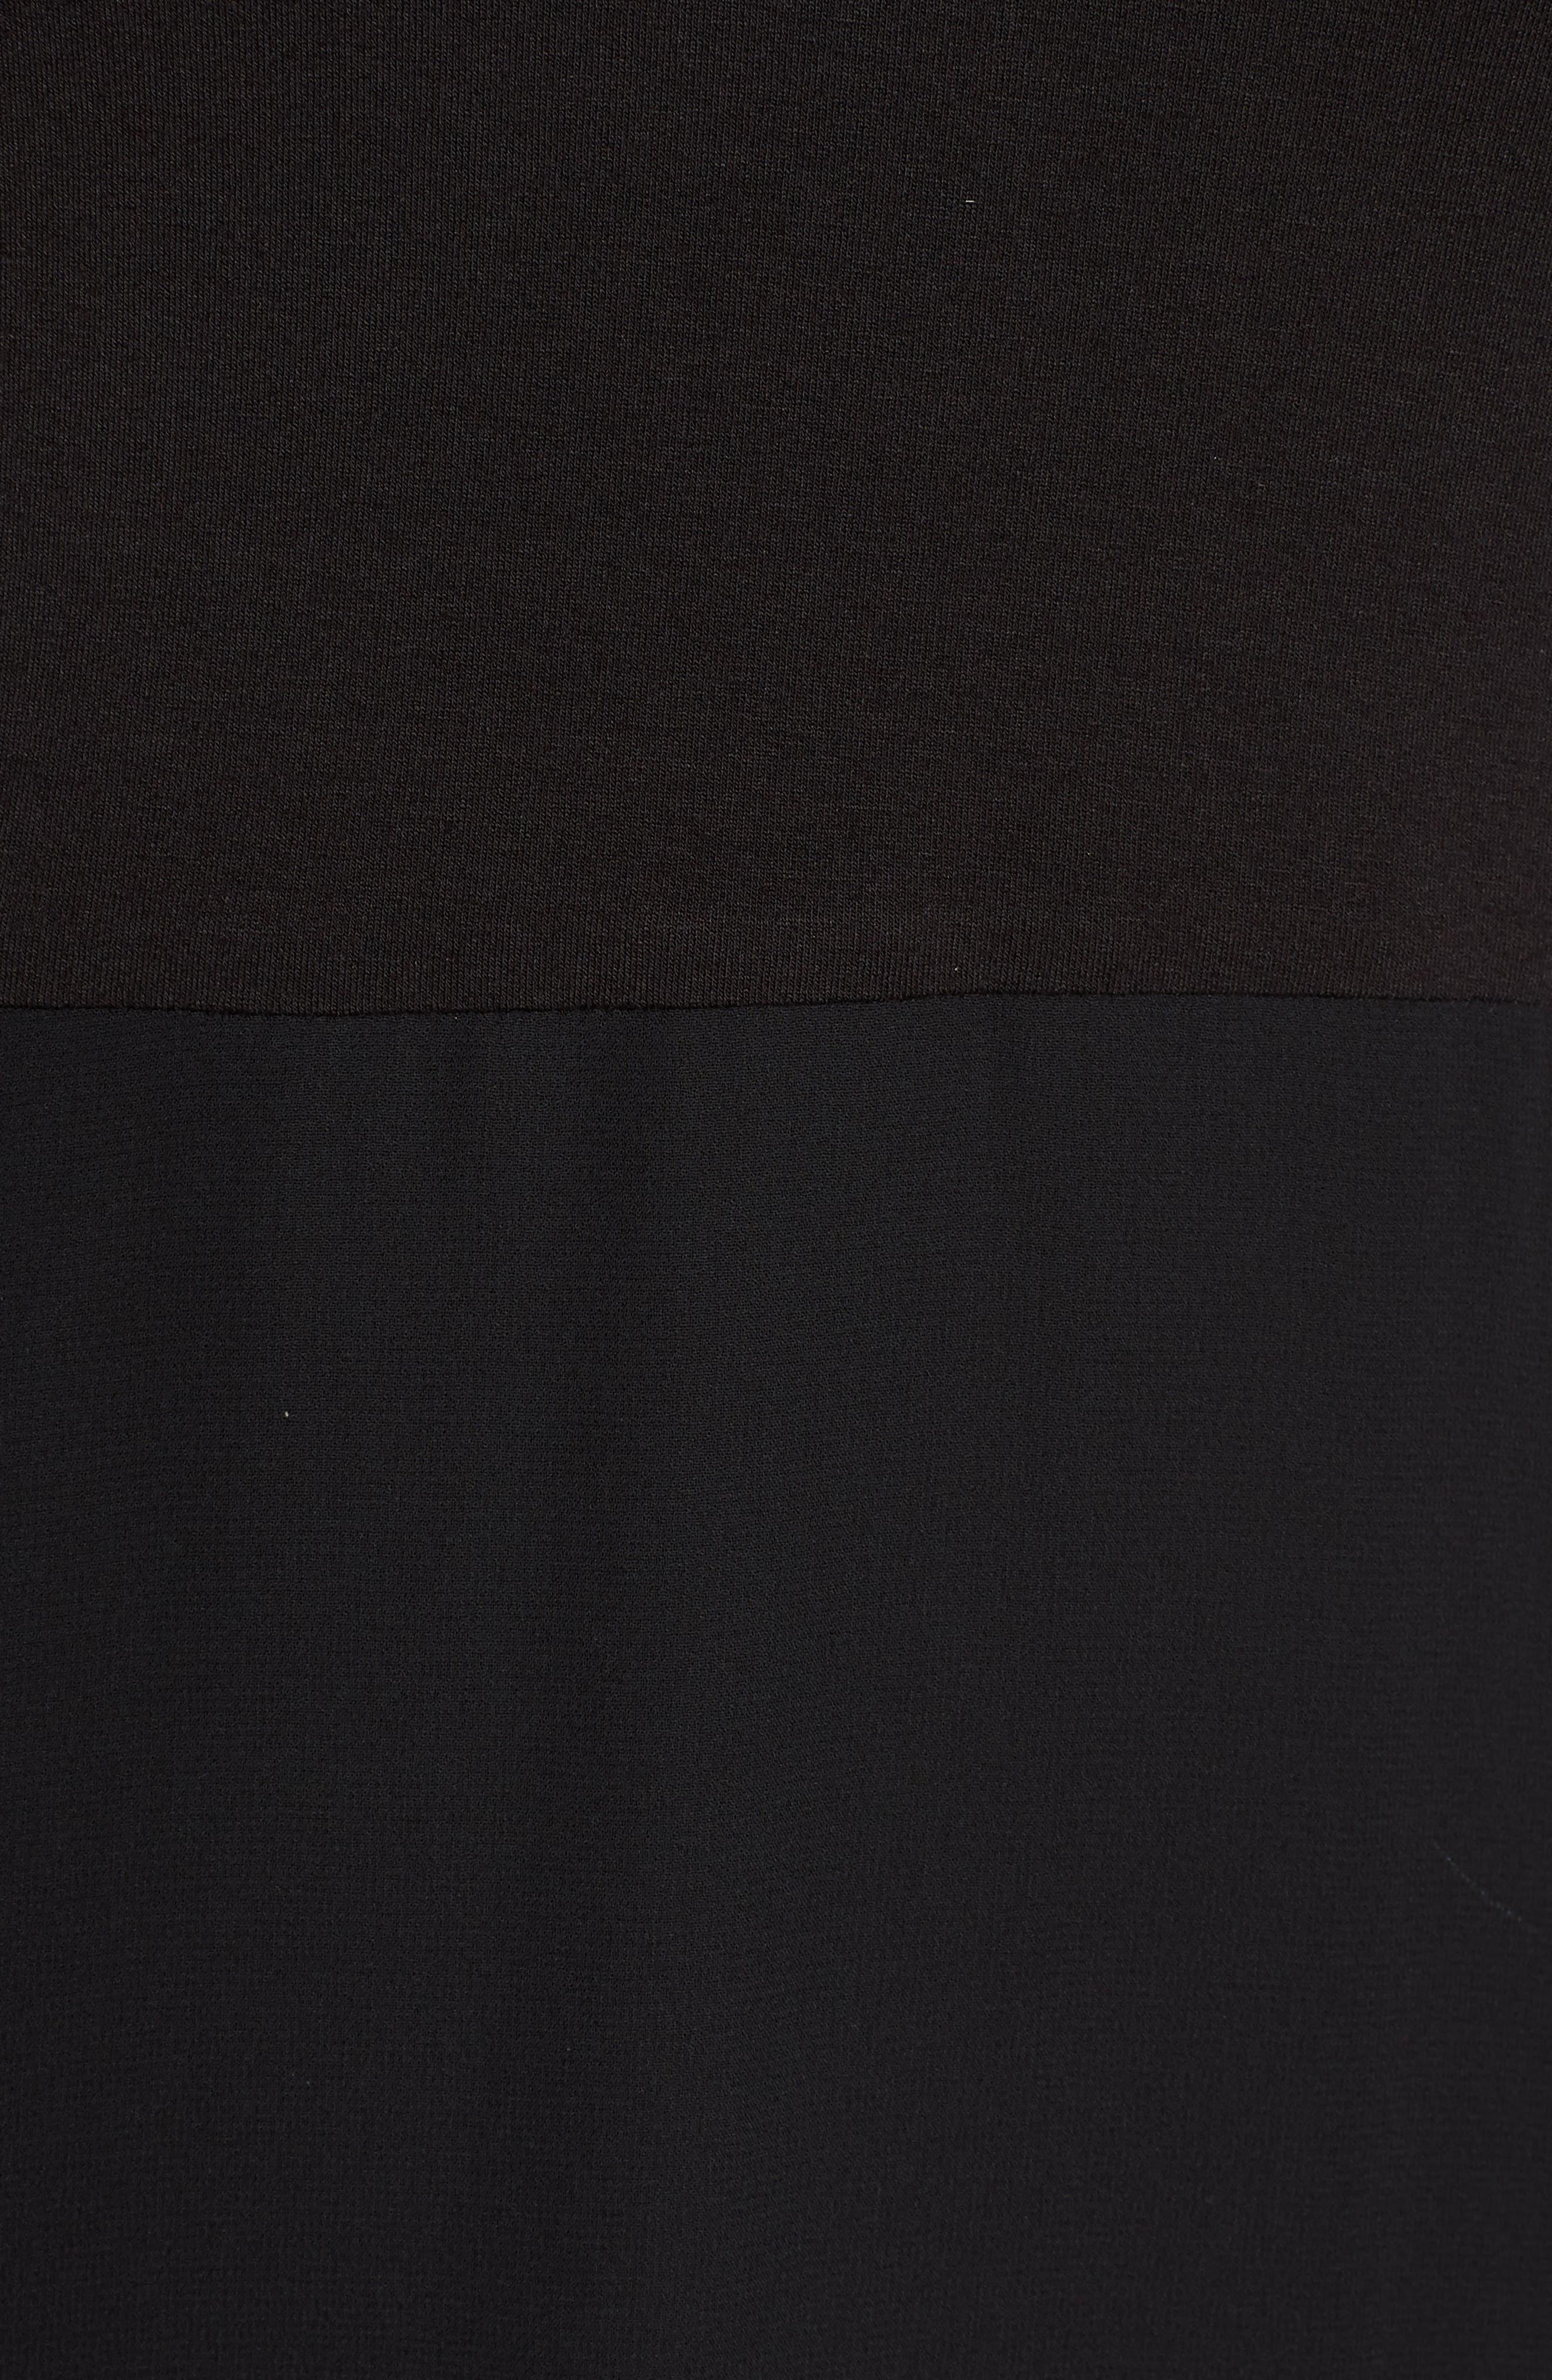 Chiffon Overlay Maxi Dress,                             Alternate thumbnail 6, color,                             RICH BLACK